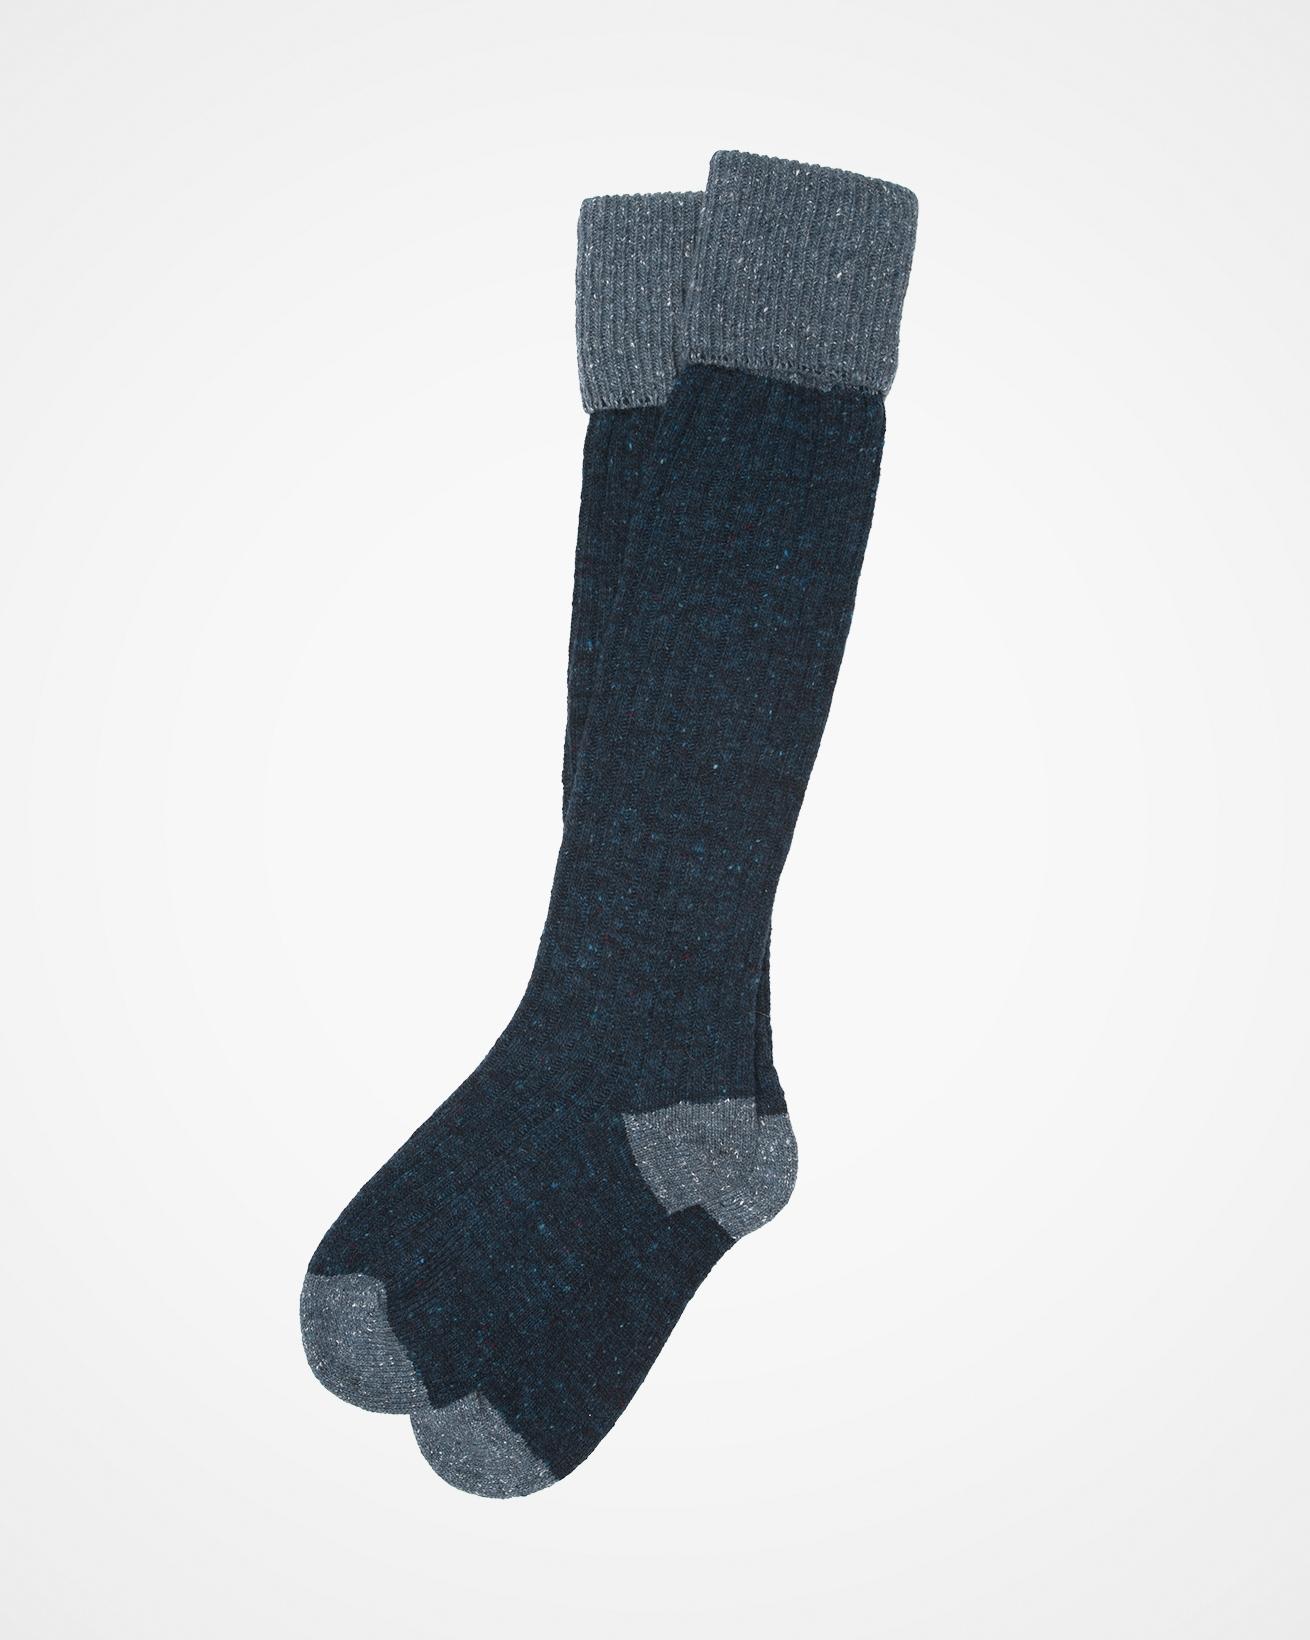 7775_mens-donegal-boot-sock_dark-navy.jpg